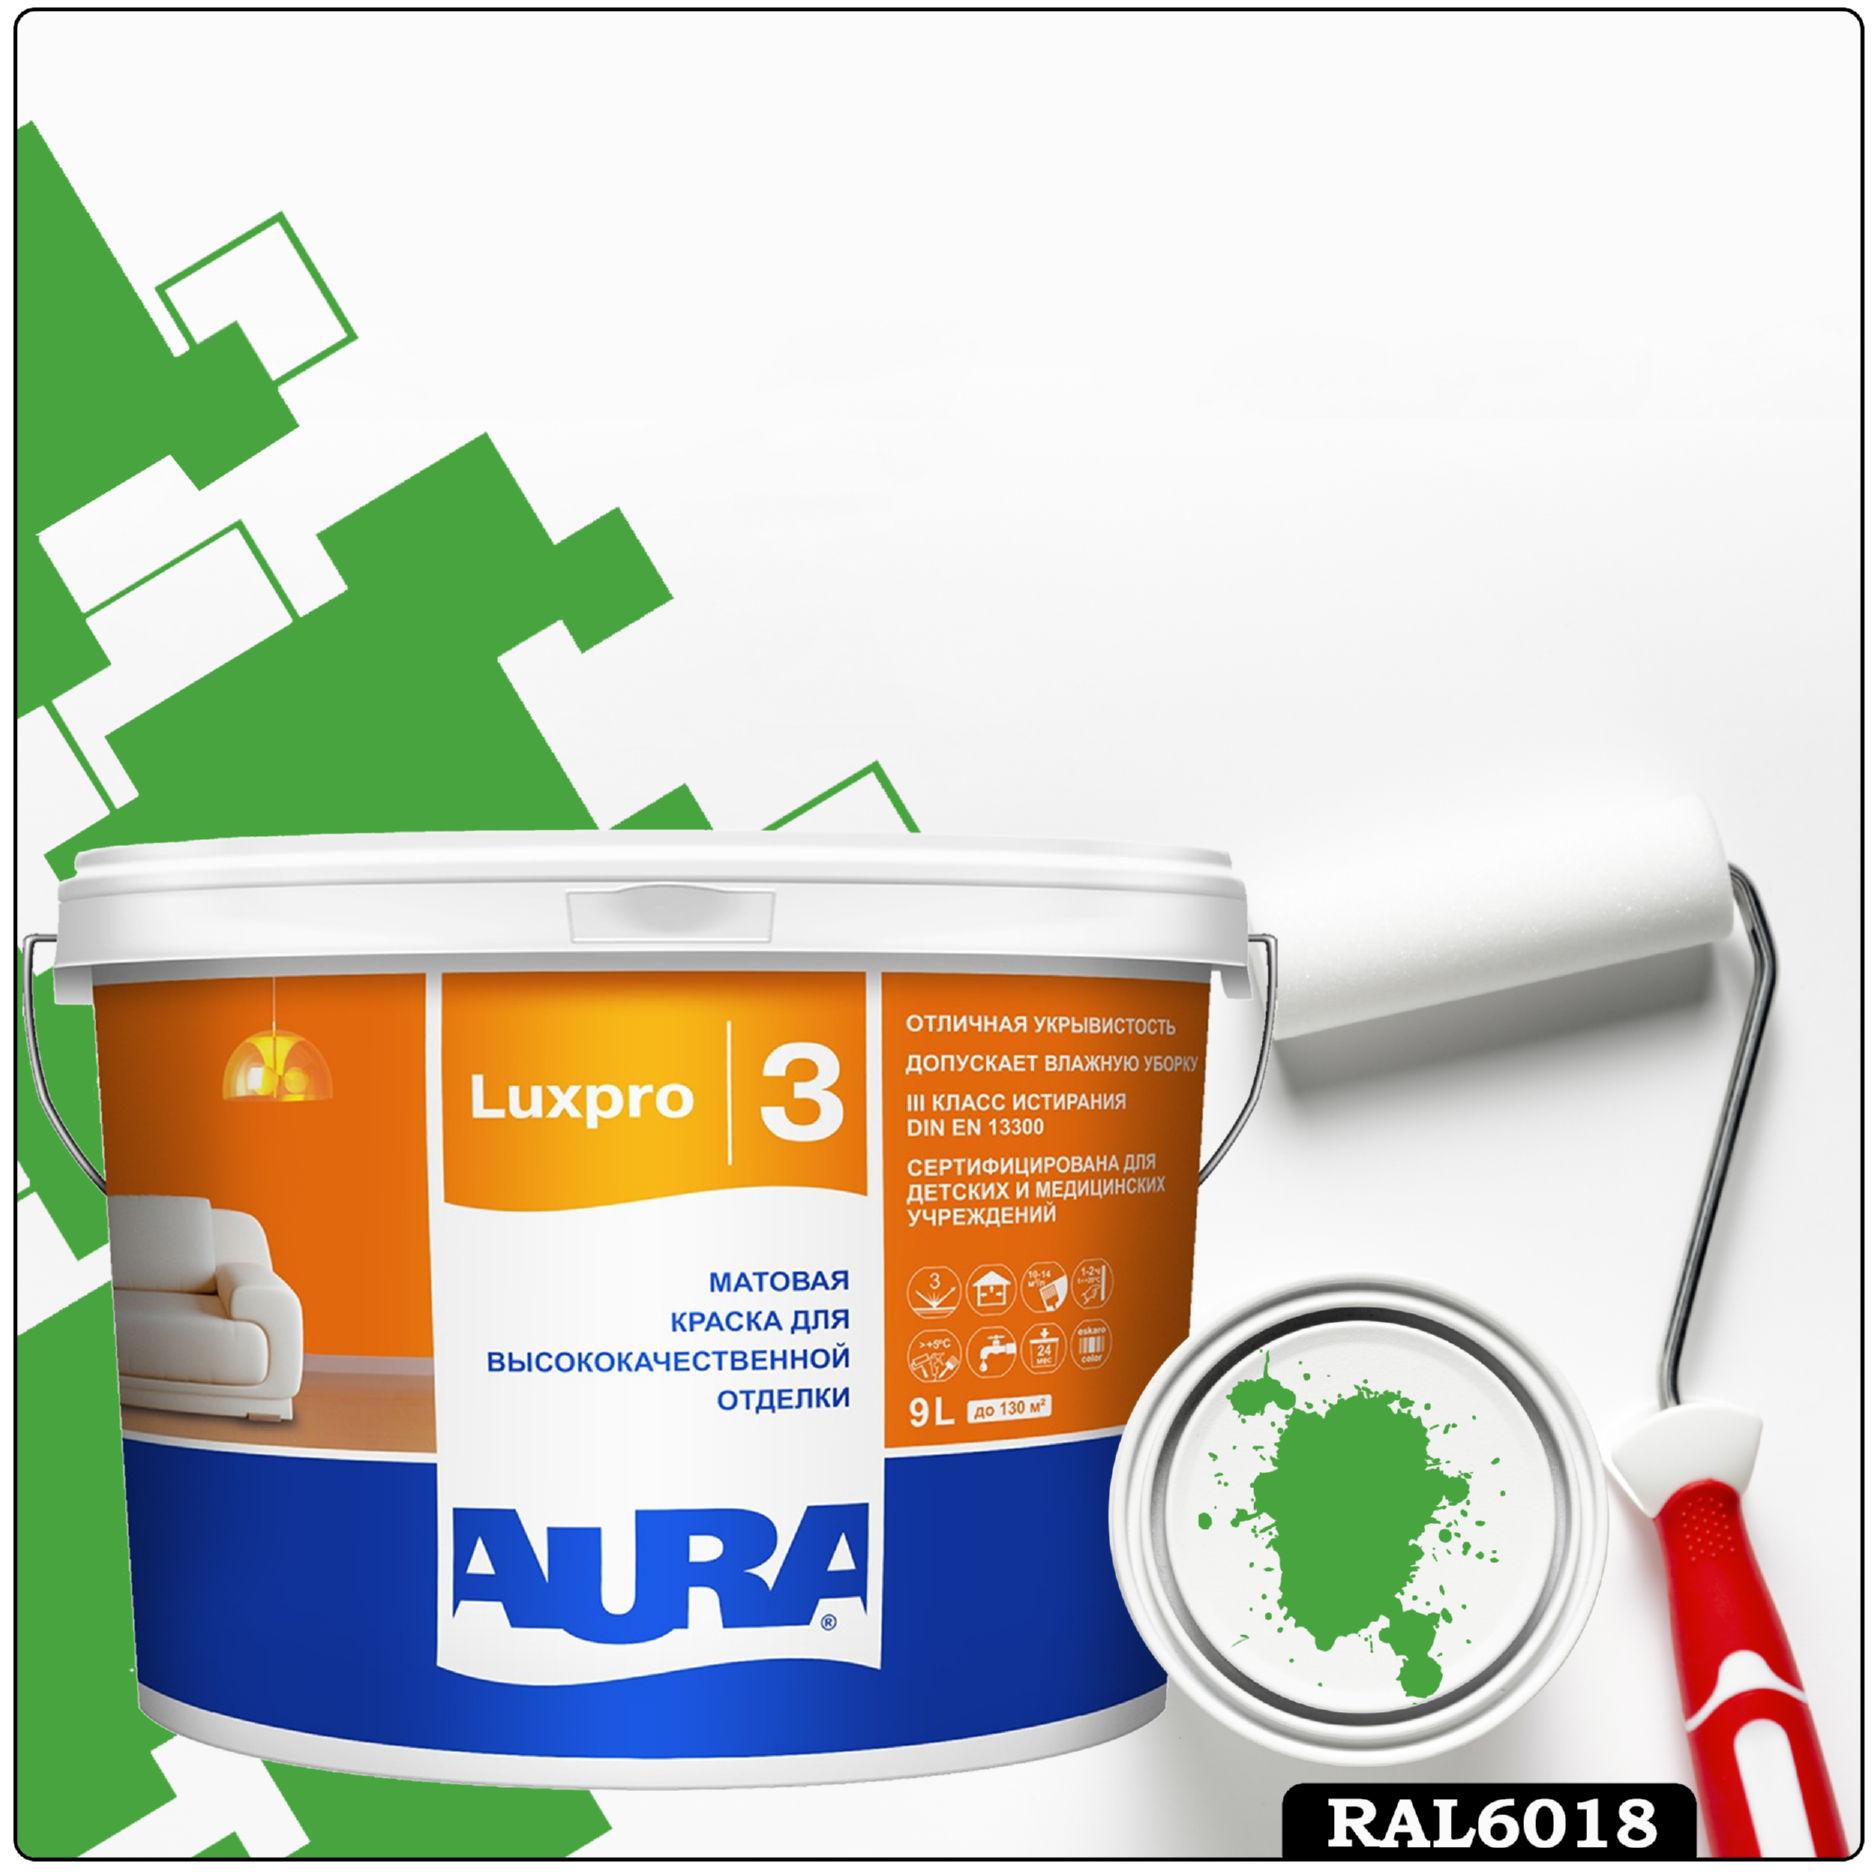 Фото 2 - Краска Aura LuxPRO 3, RAL 6018 Жёлто-зелёный, латексная, шелково-матовая, интерьерная, 9л, Аура.